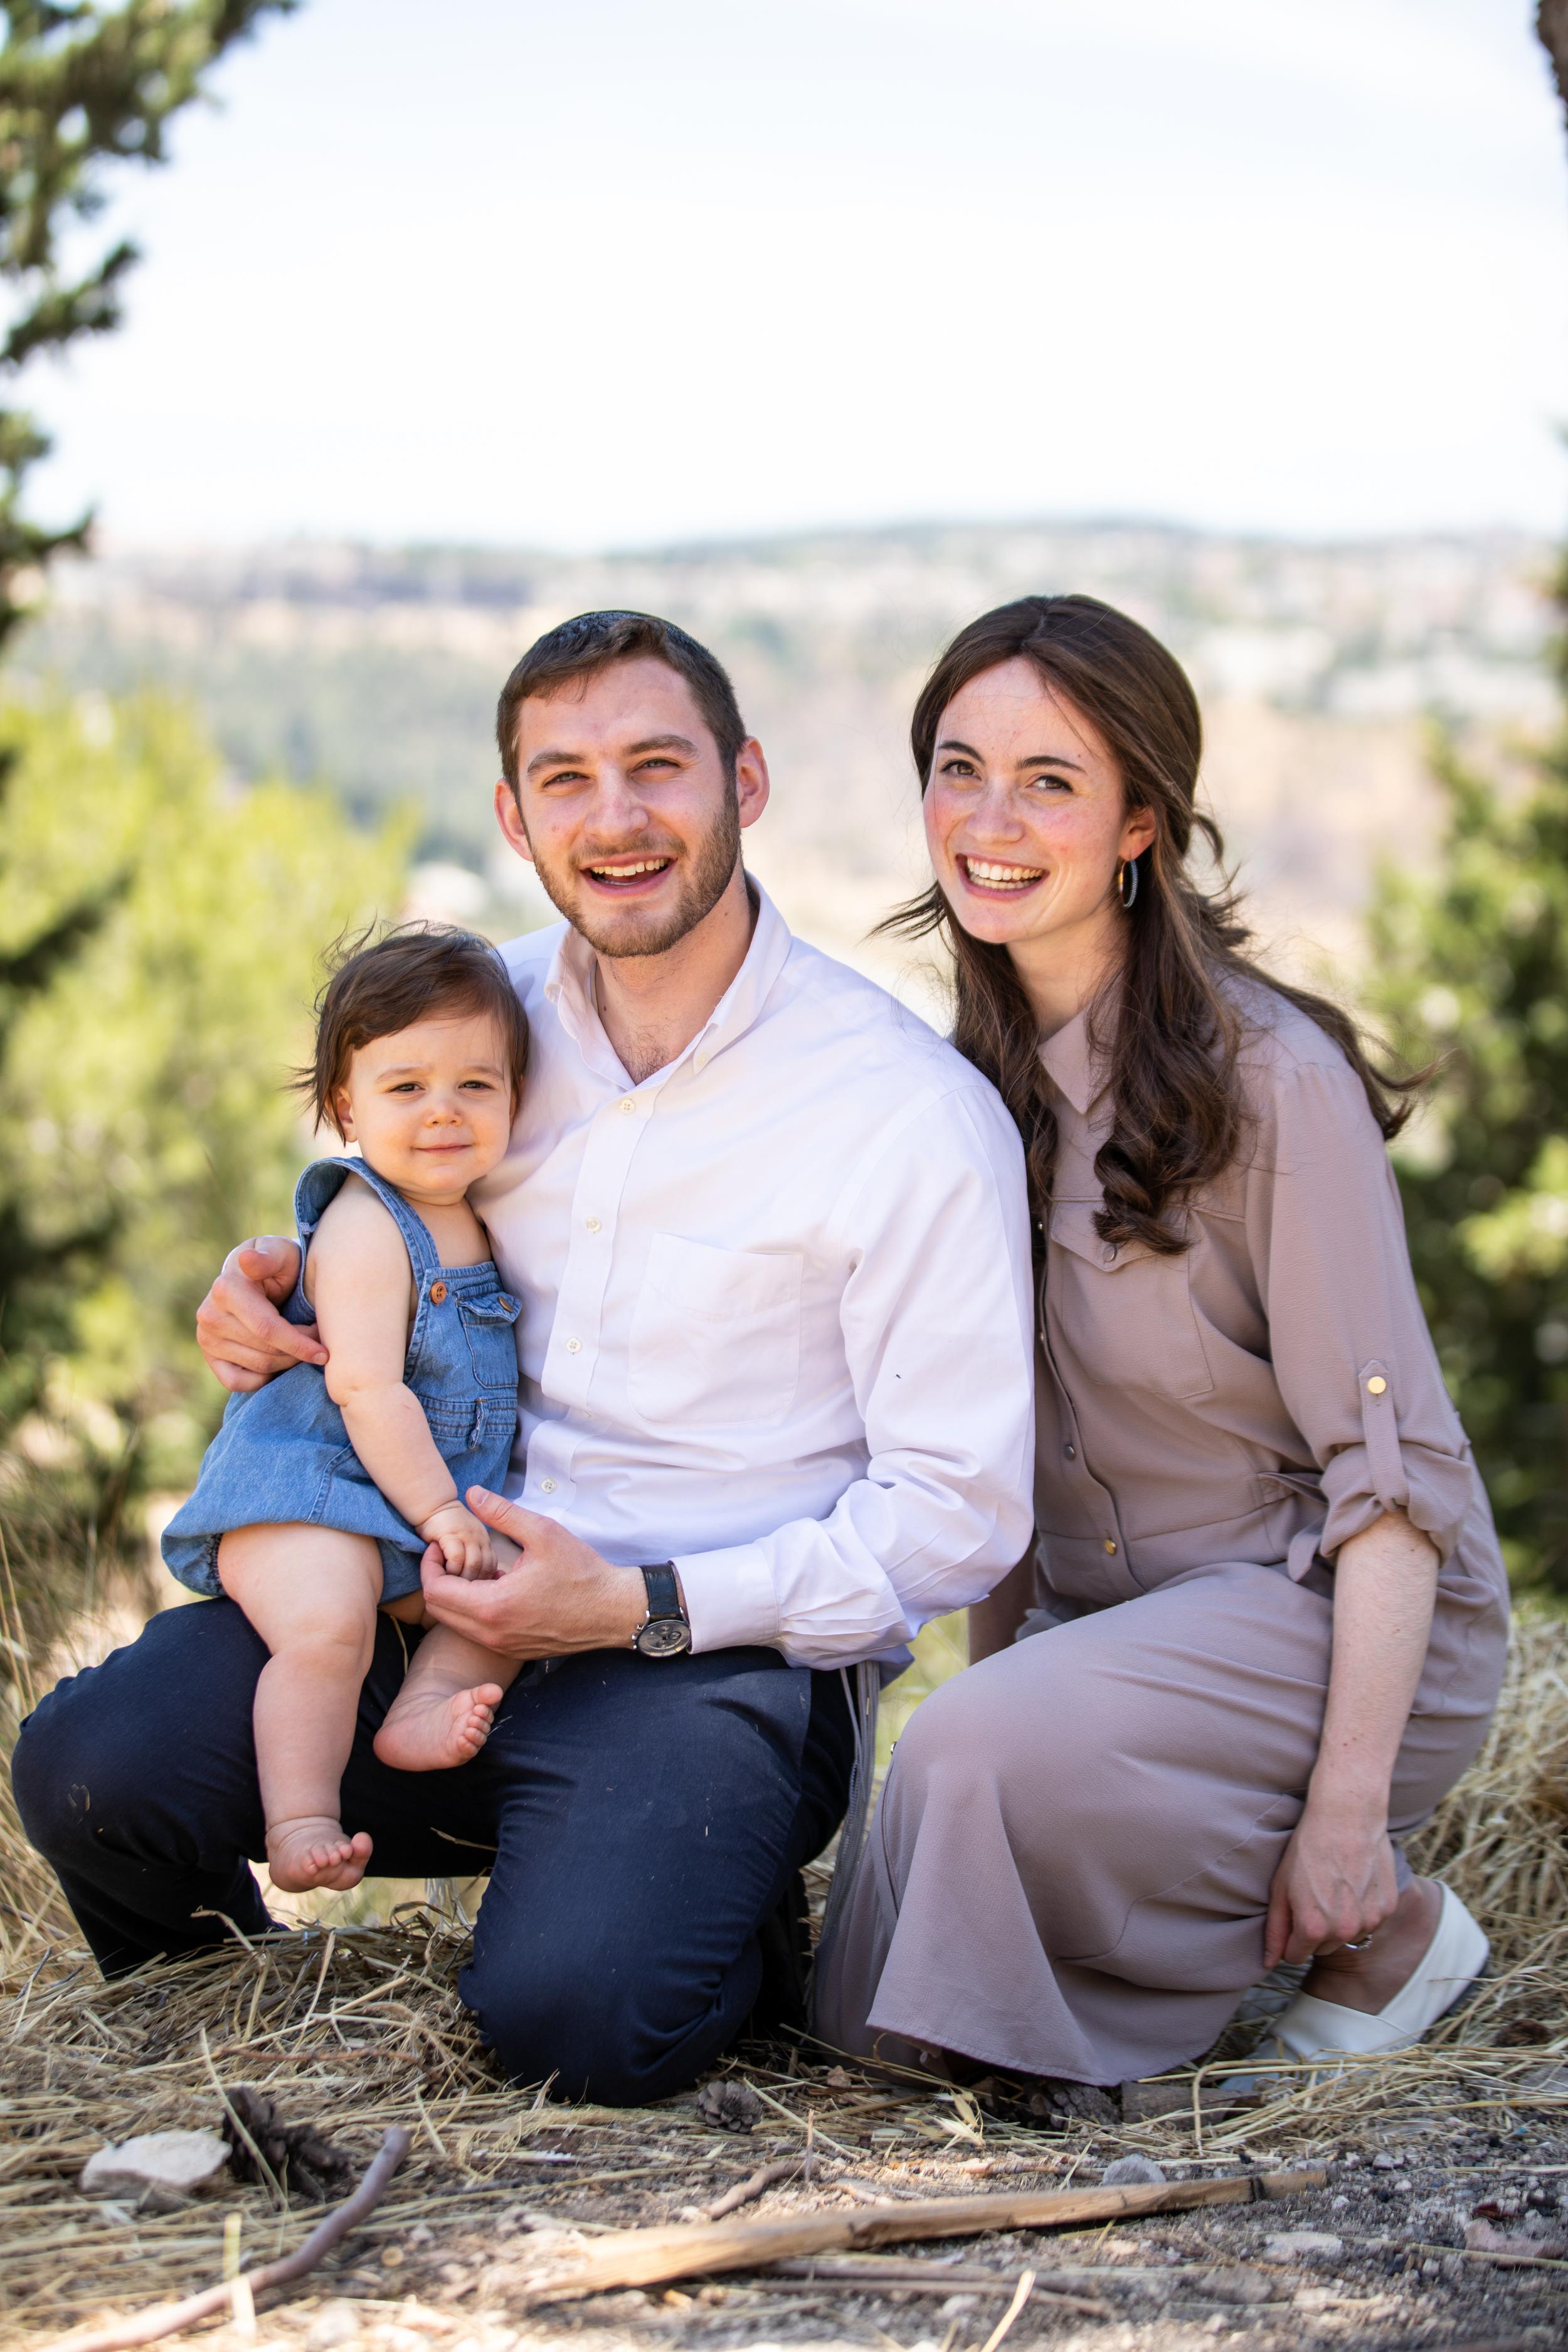 families_jdc_5726.jpg